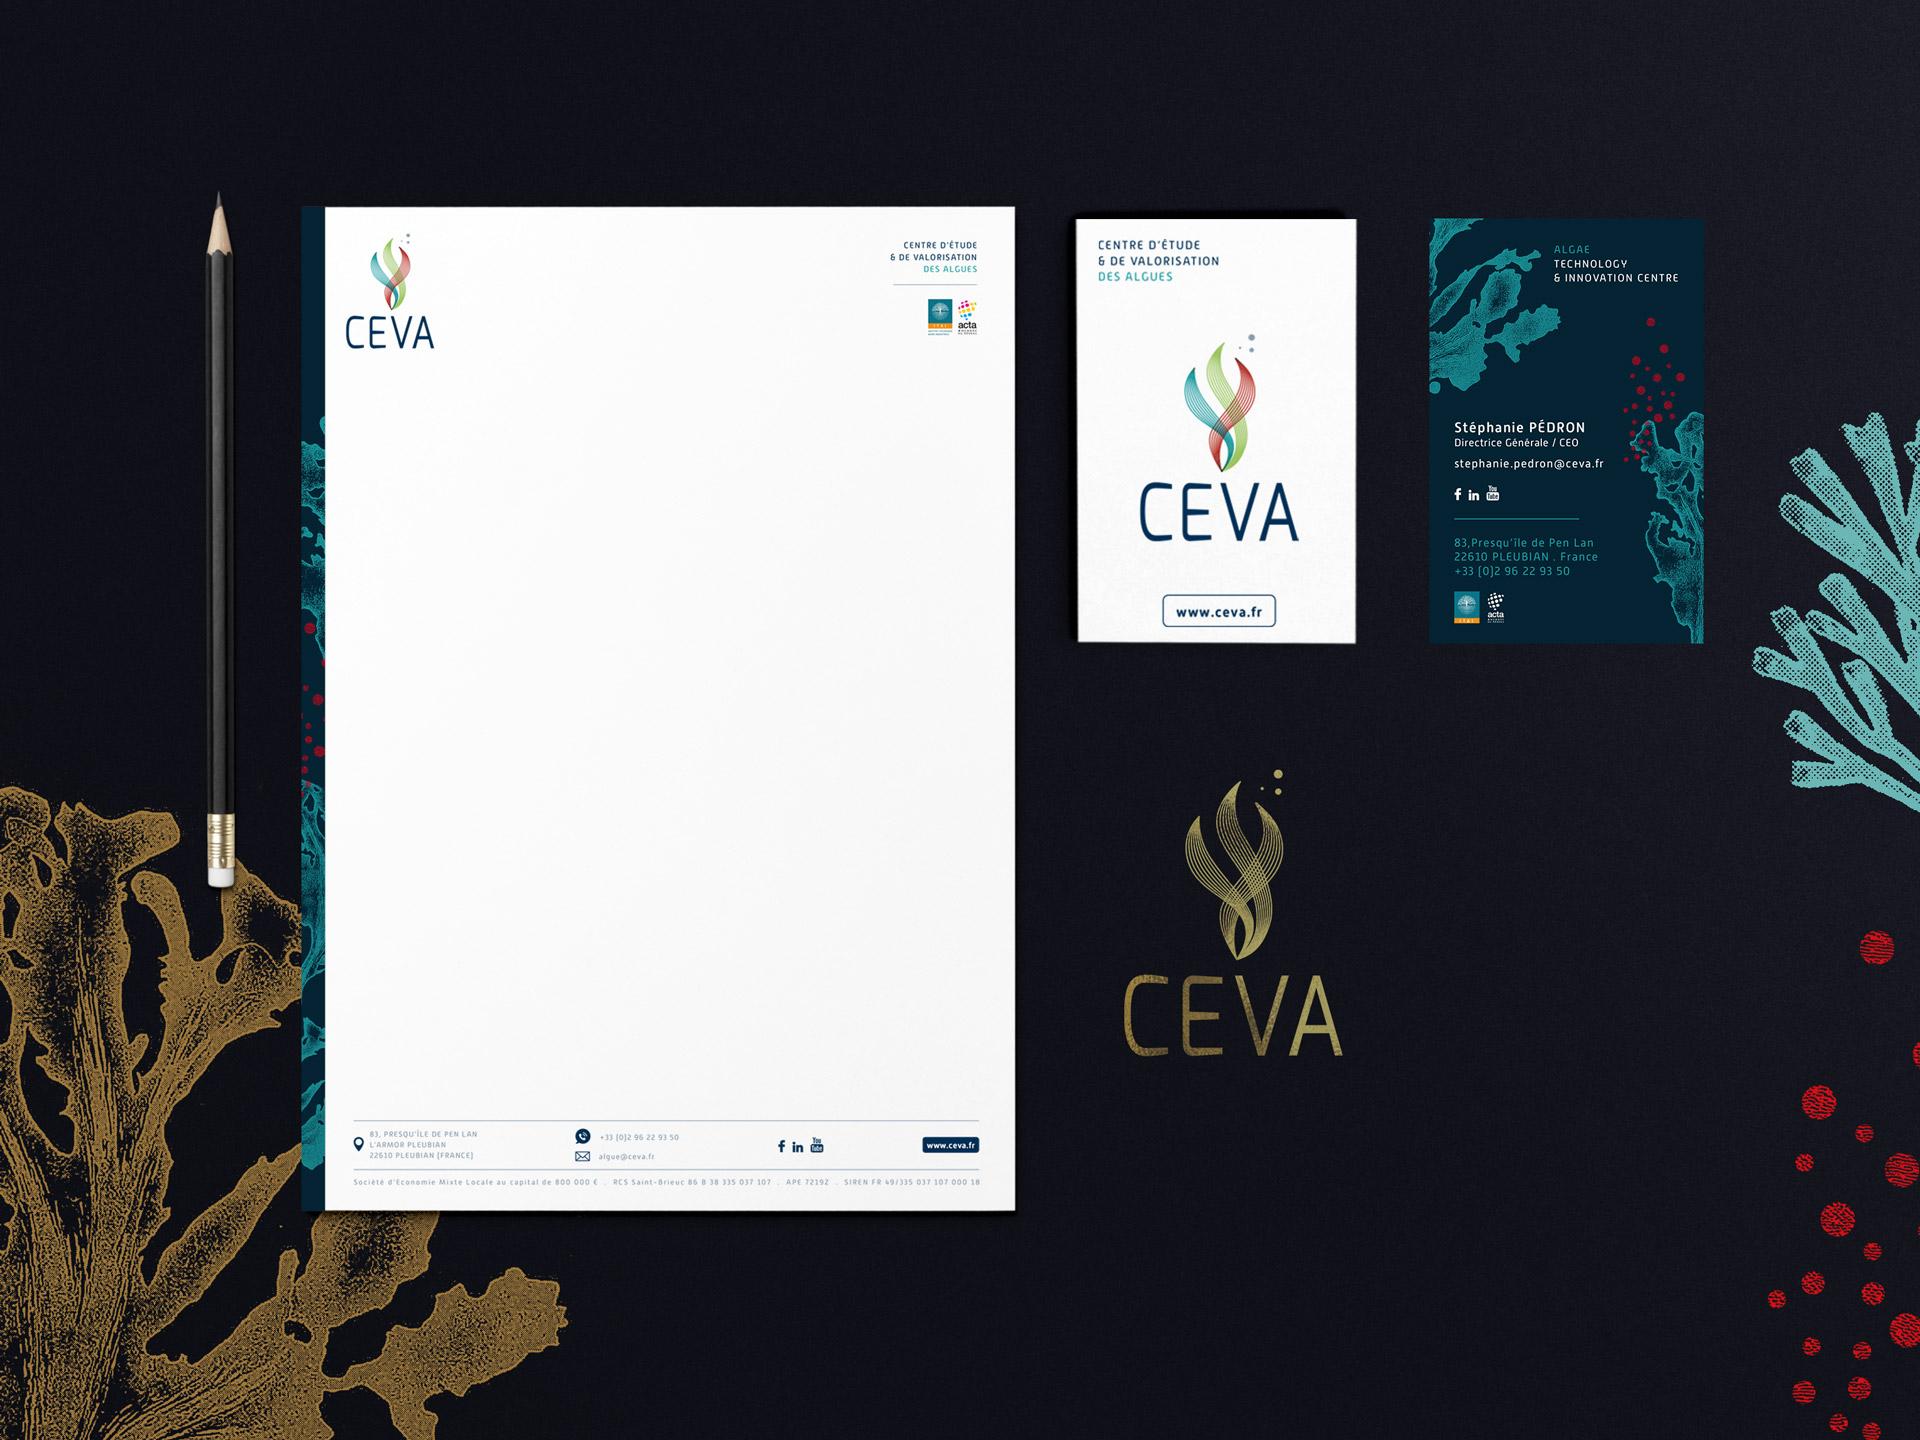 CEVA-logo by Coqueliko